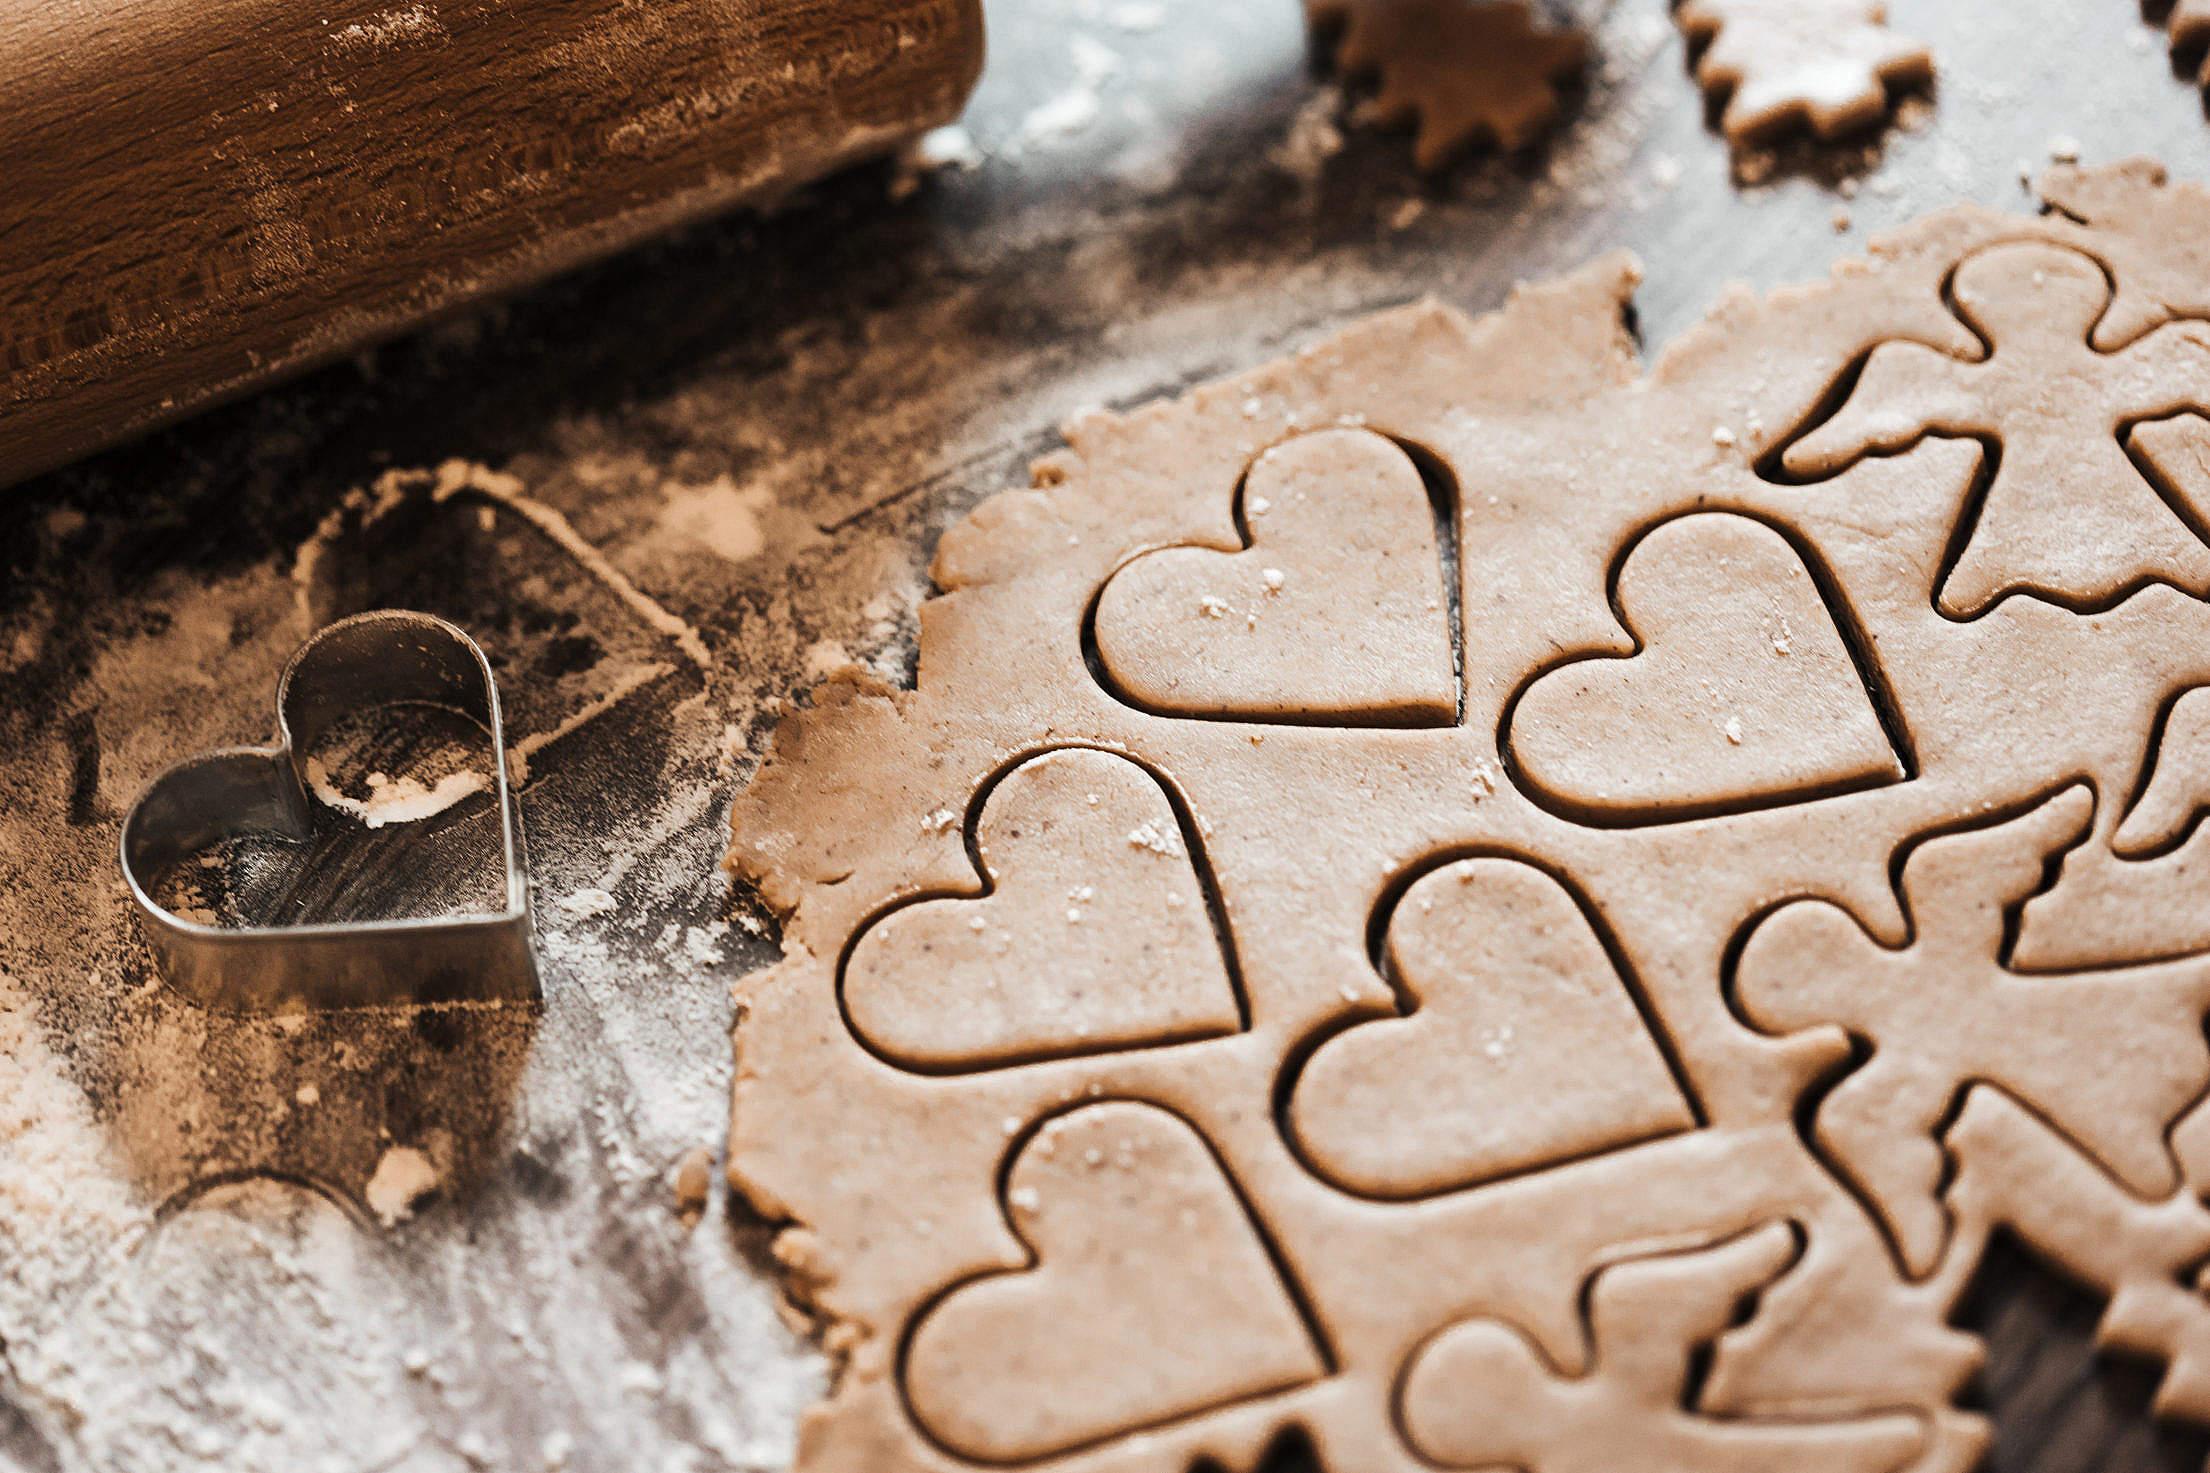 Baking Christmas Lovely Hearts Sweets Free Stock Photo